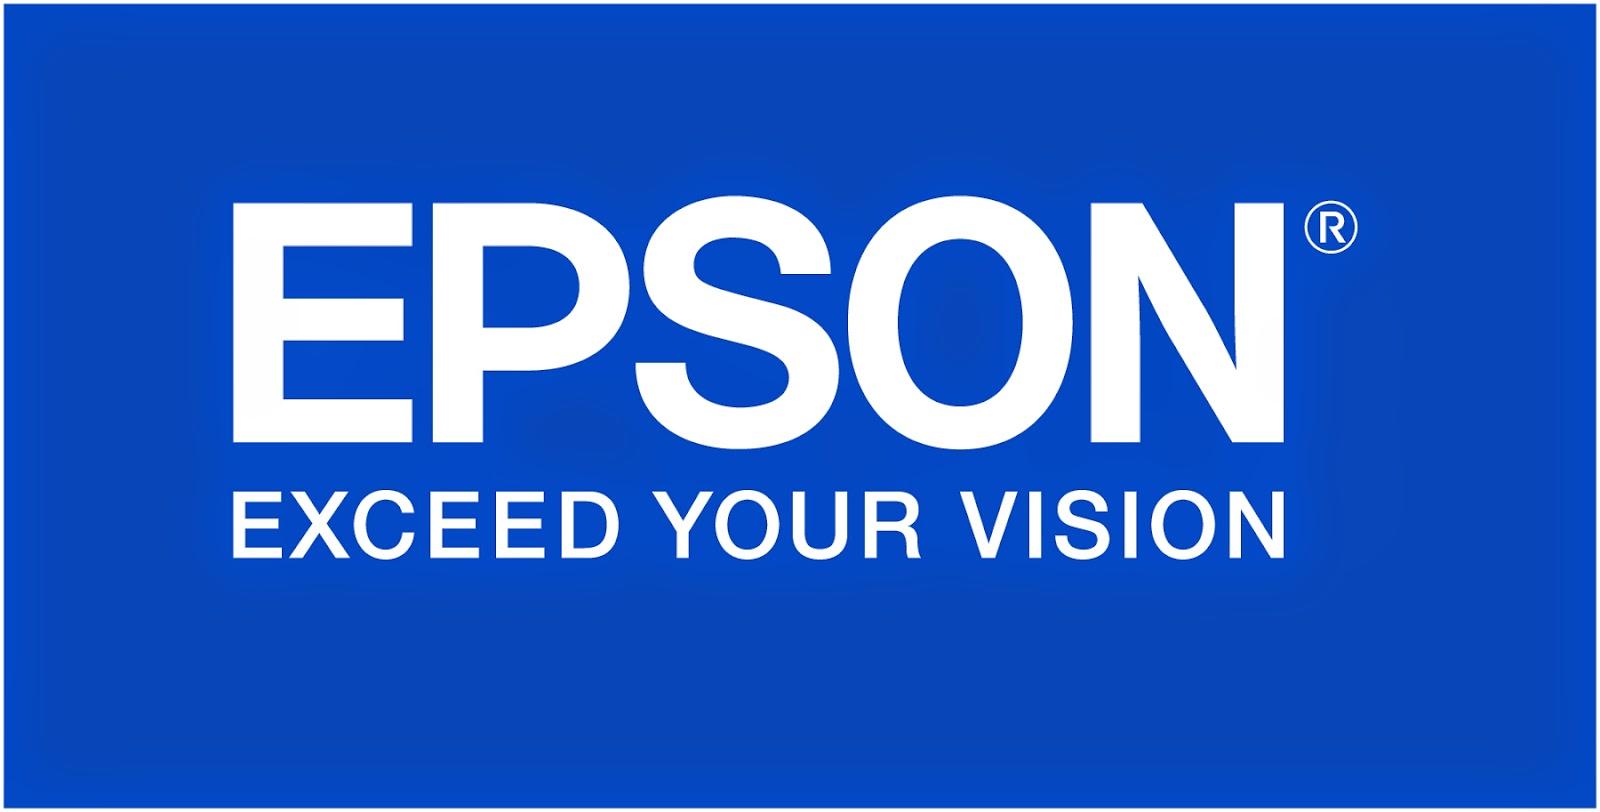 Lowongan Kerja Terbaru Cikarang Selatan PT. Epson Industry Untuk Lulusan SMA/SMK Sederajat